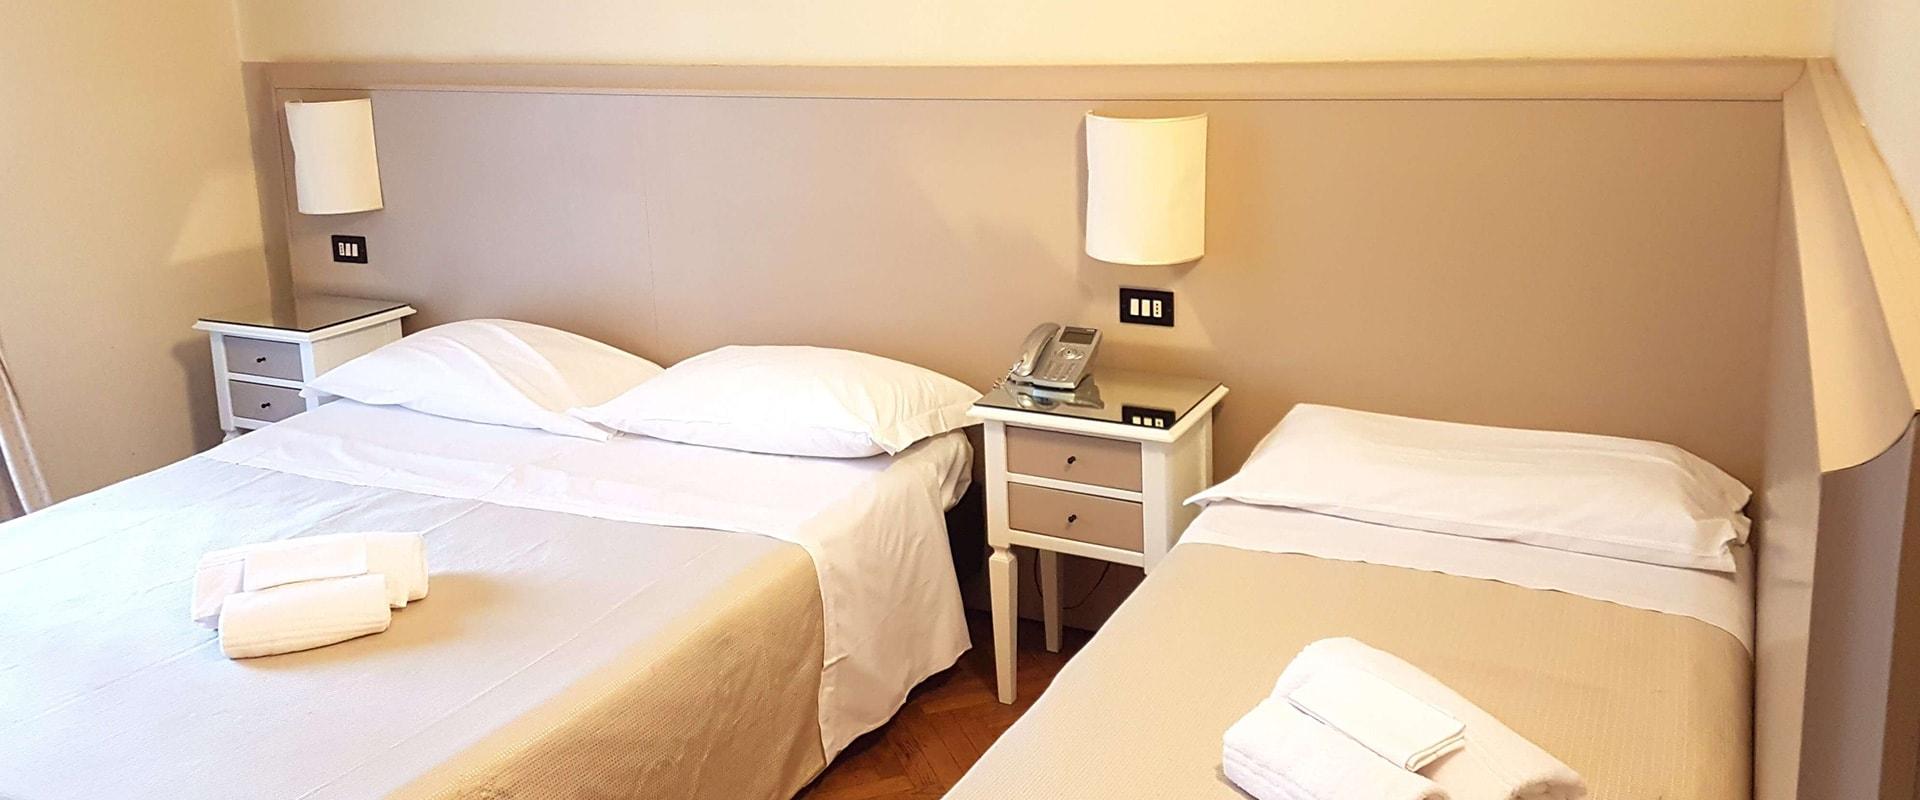 hotel economico a montecatini terme